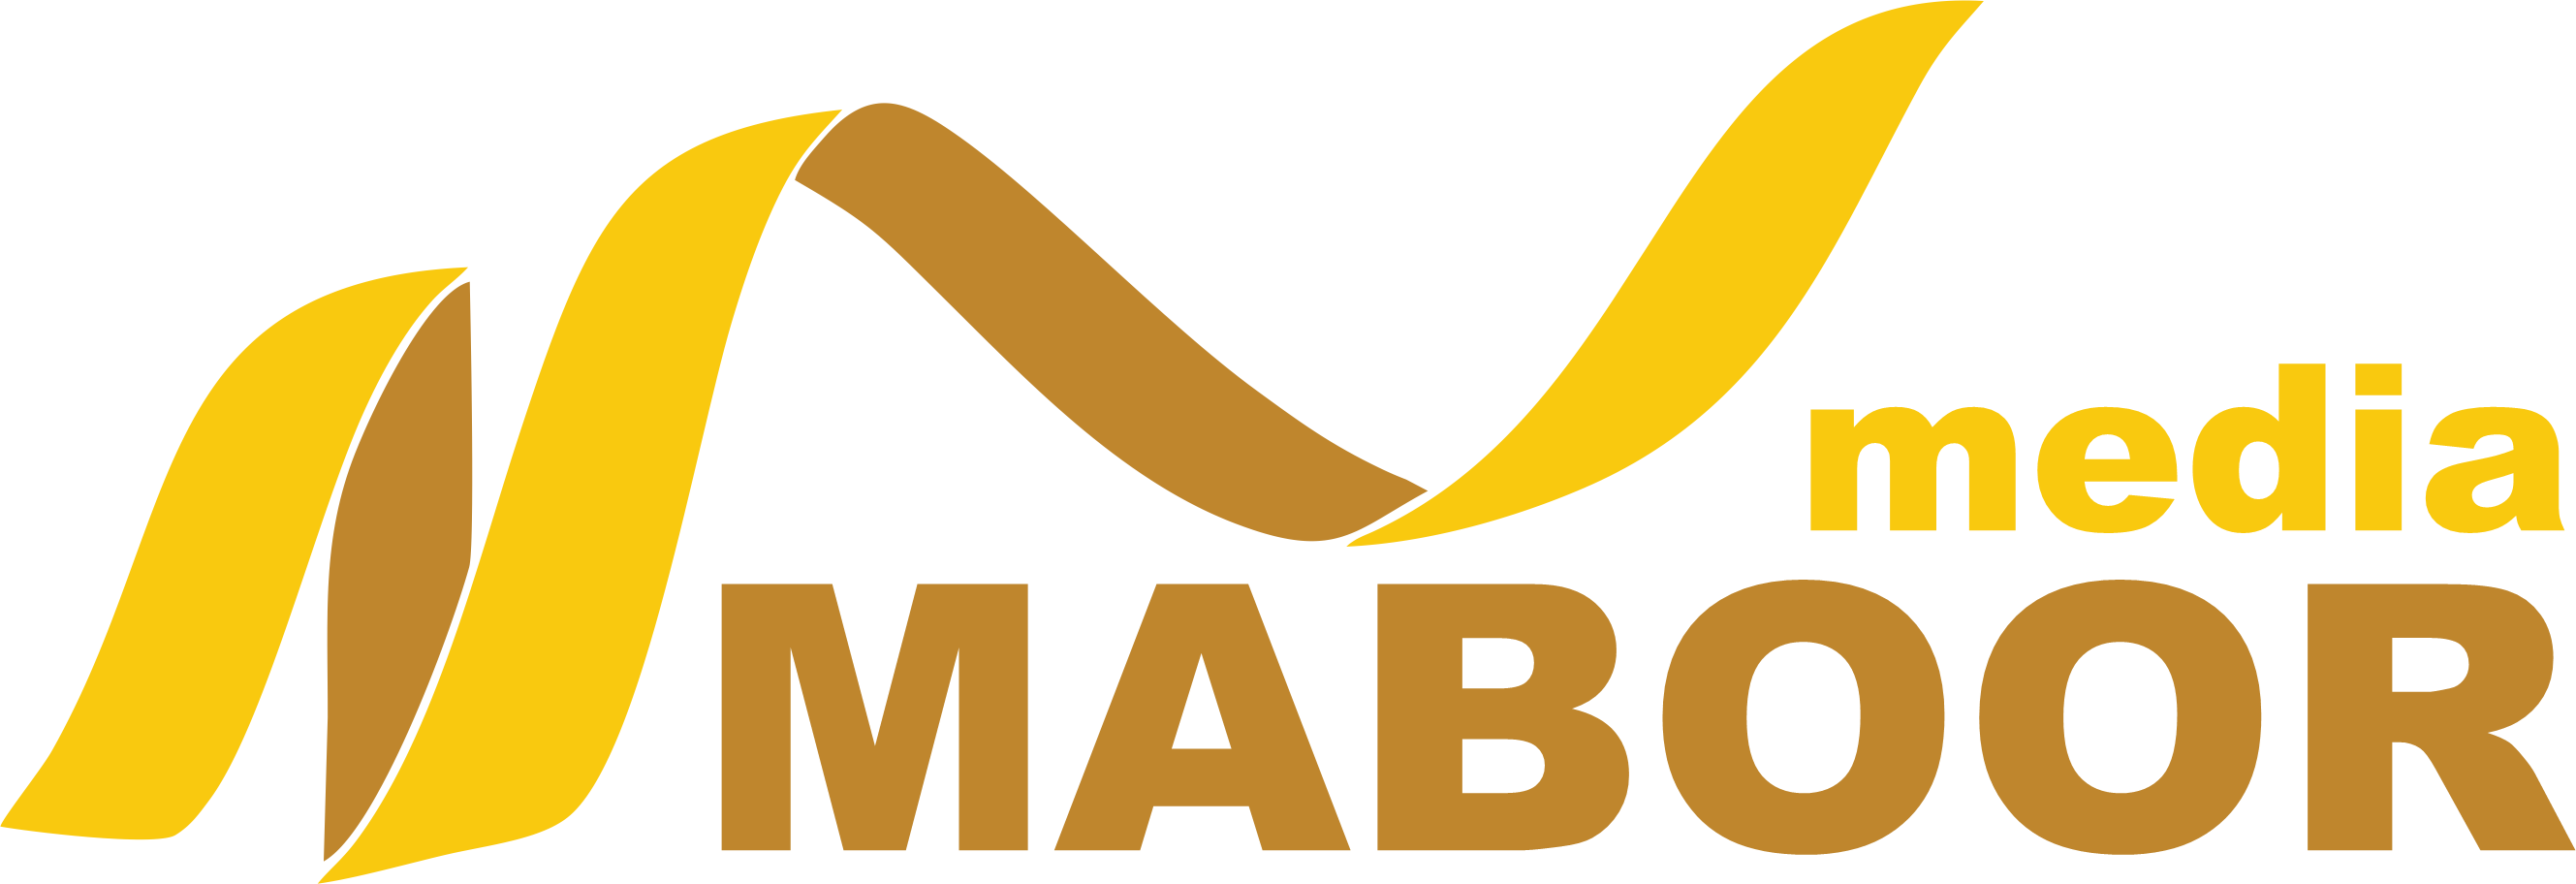 Maboor Media